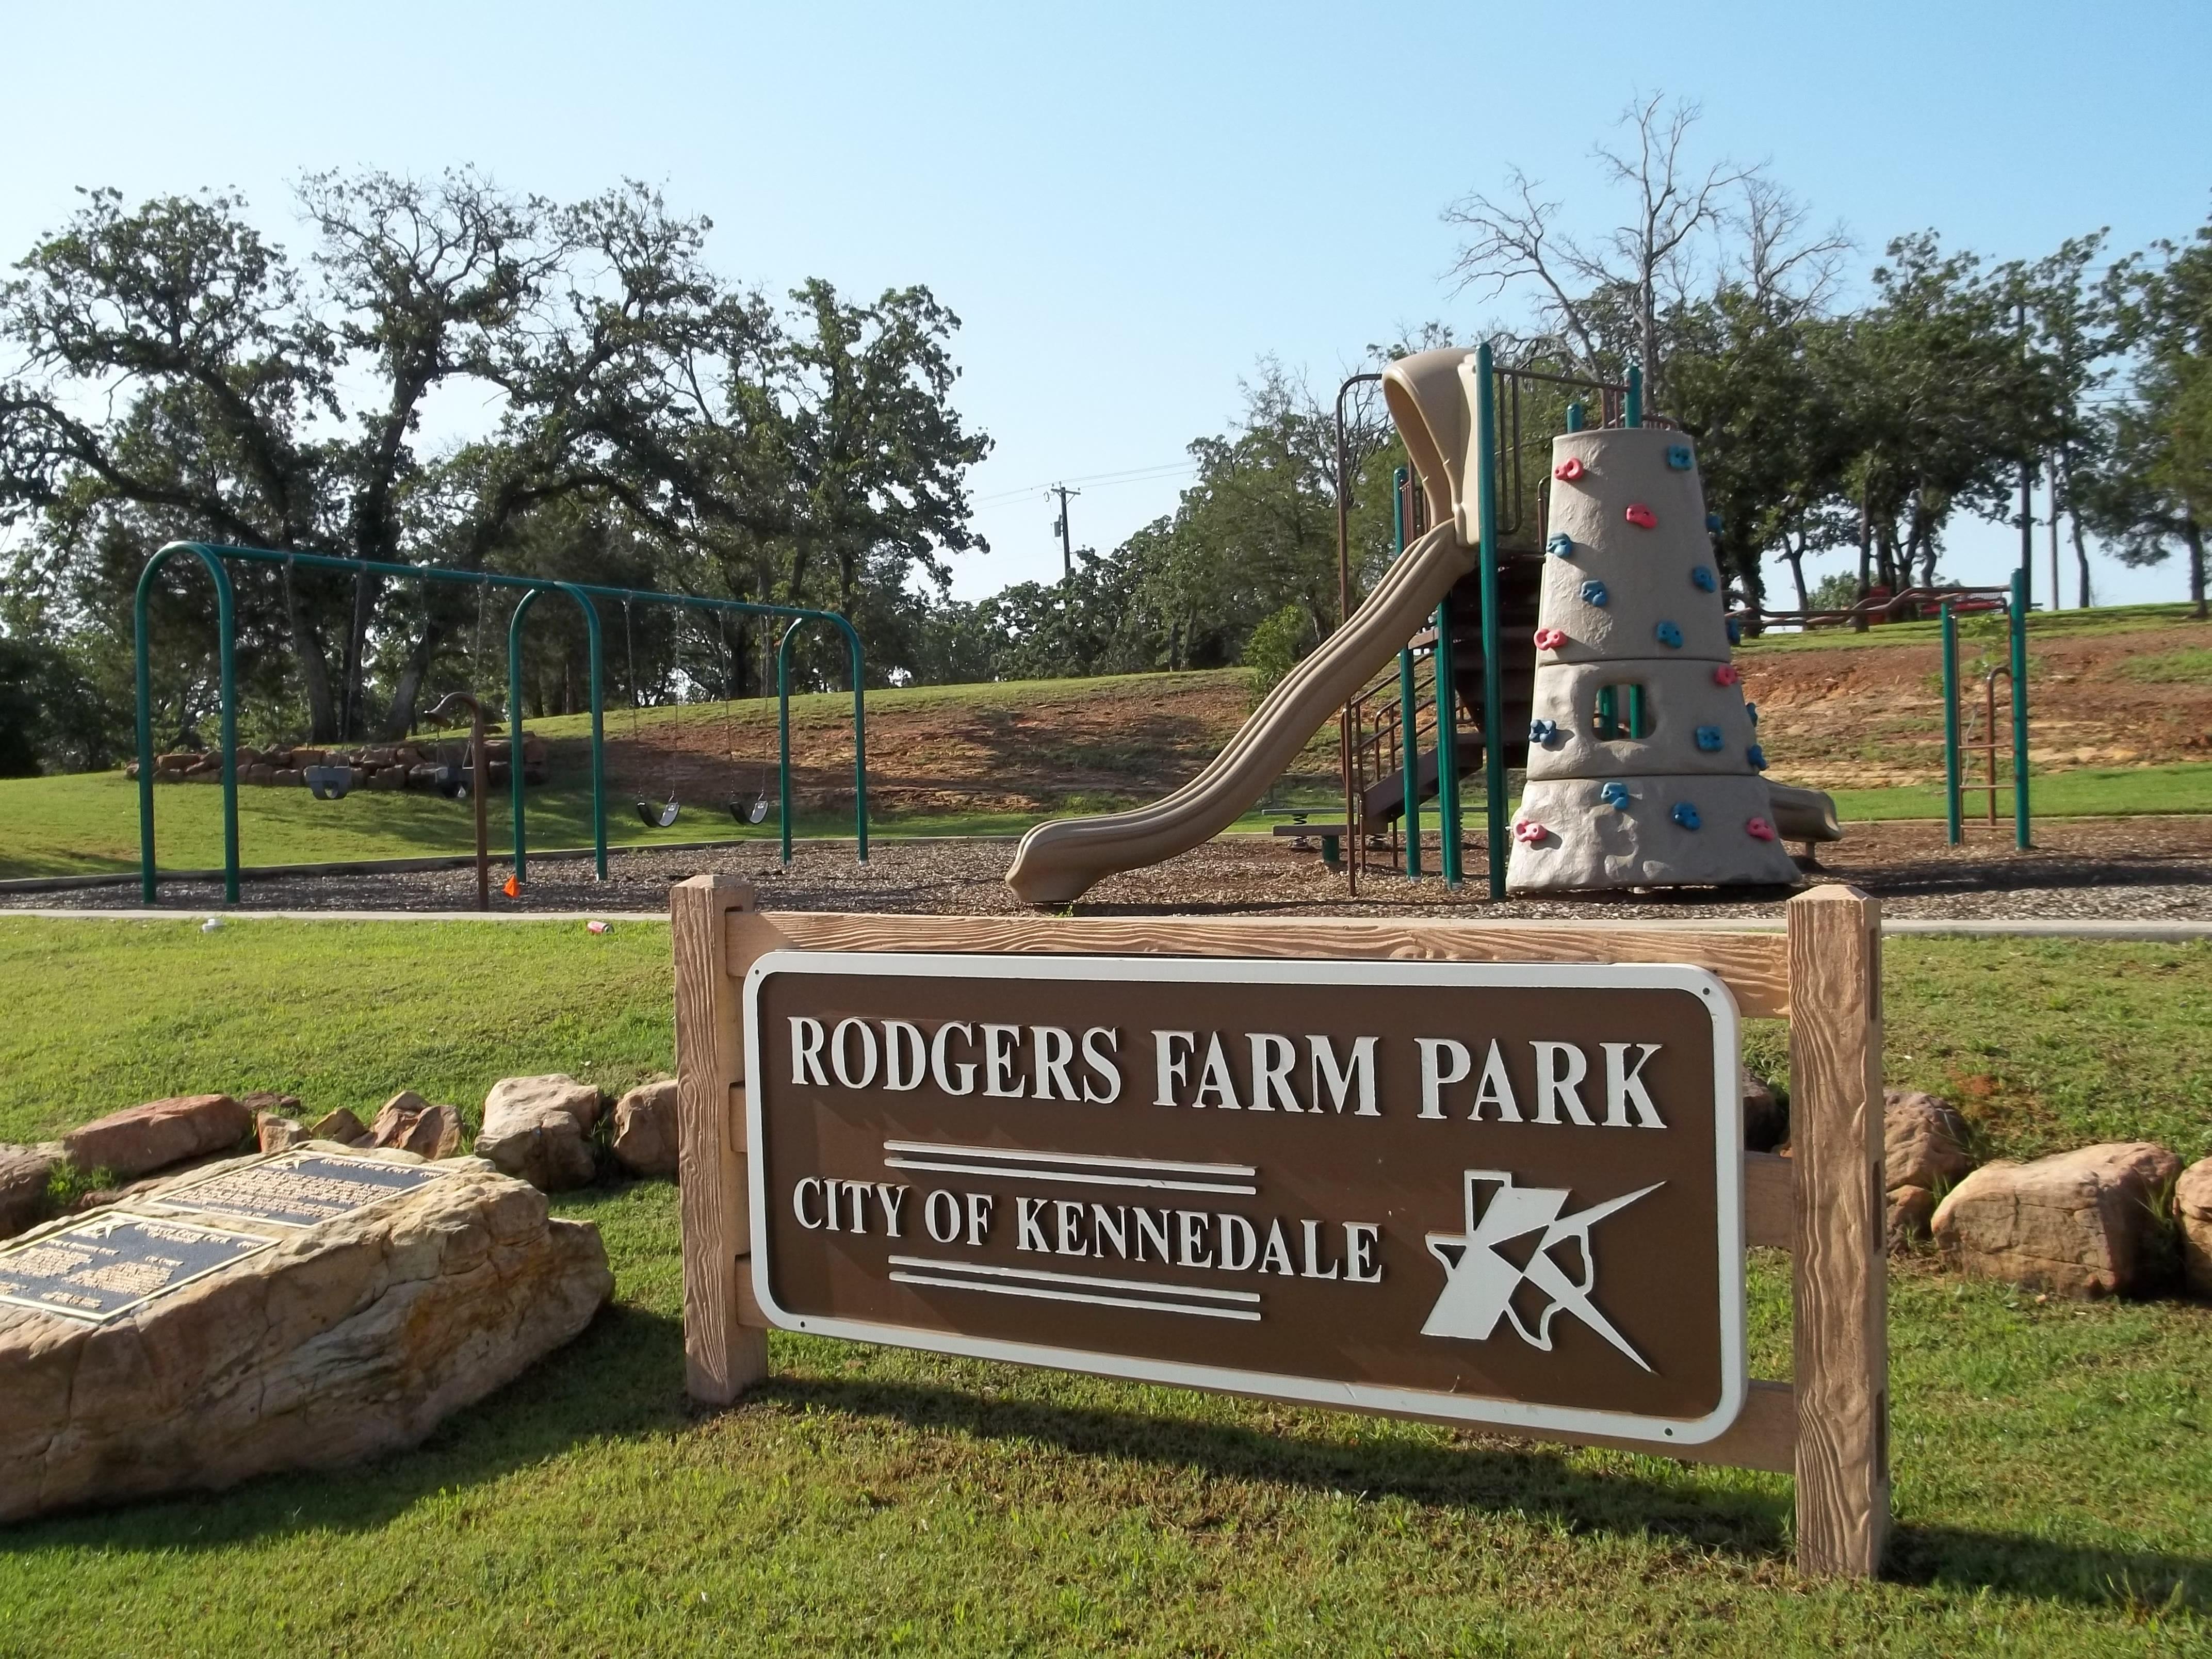 Rodgers Farm Park (7)